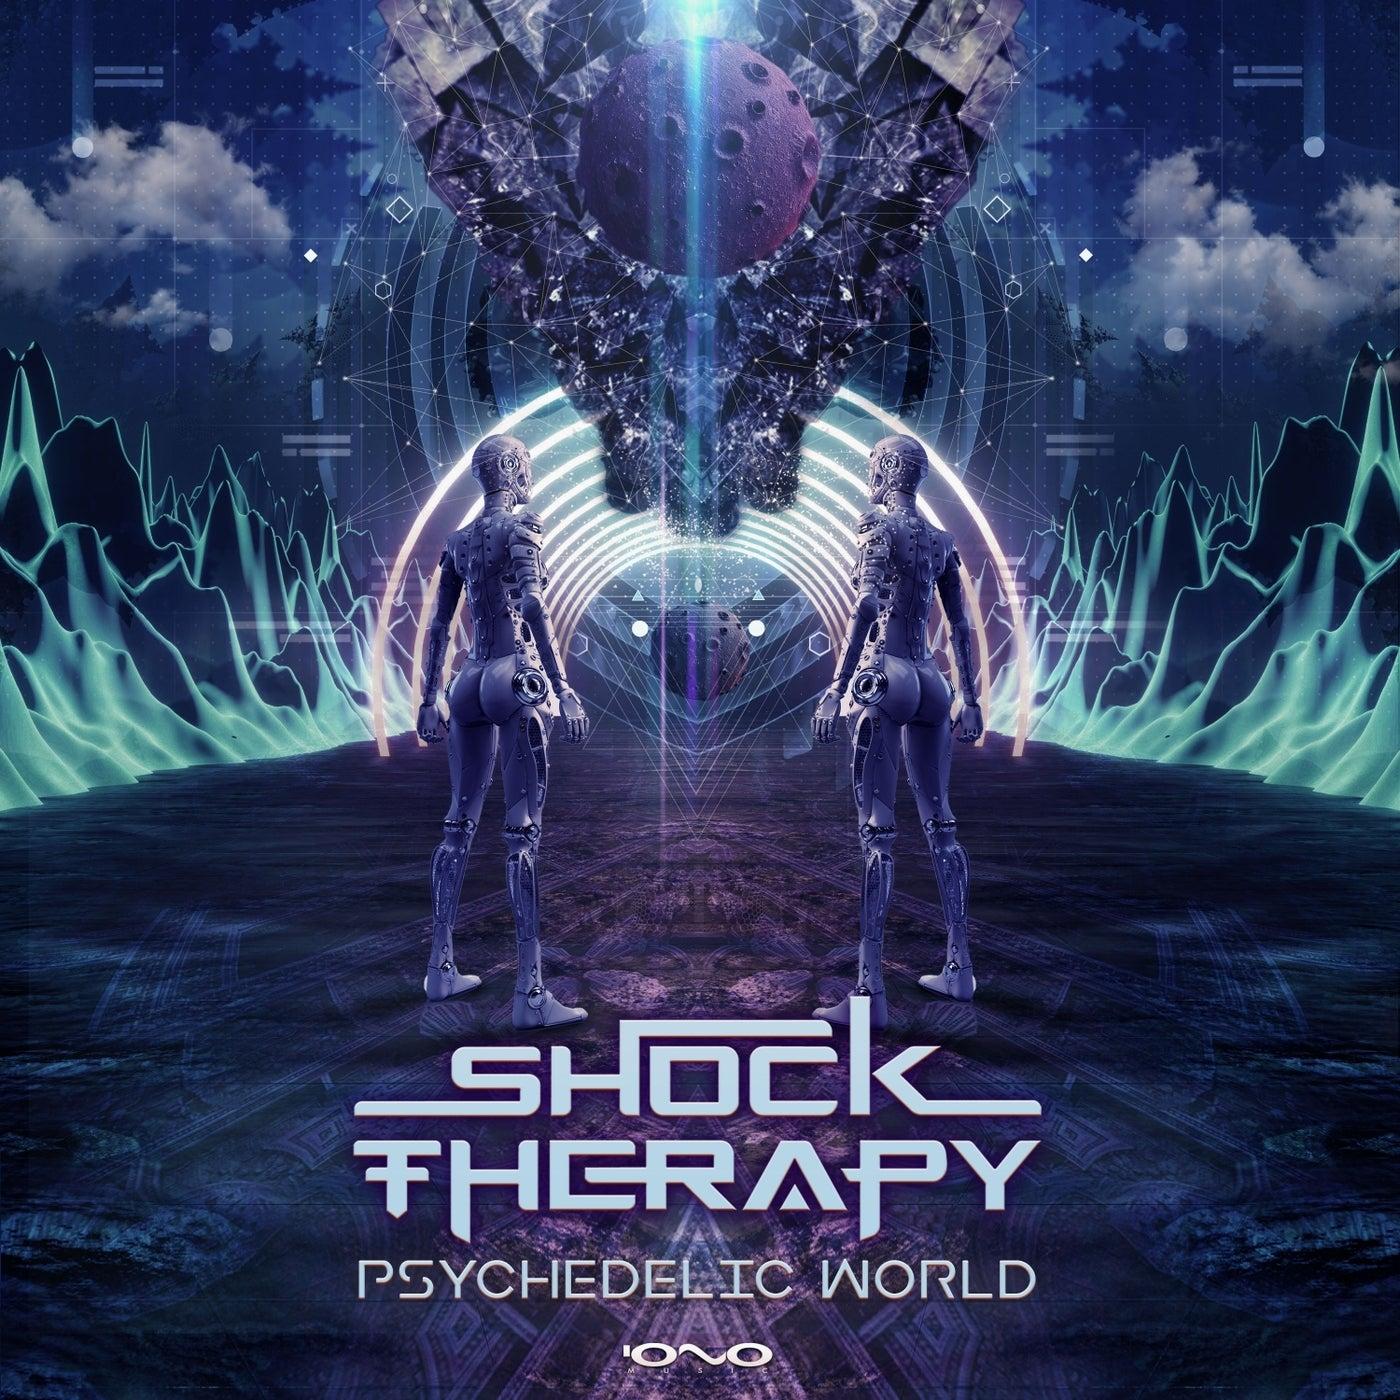 Psychedelic World (Original Mix)